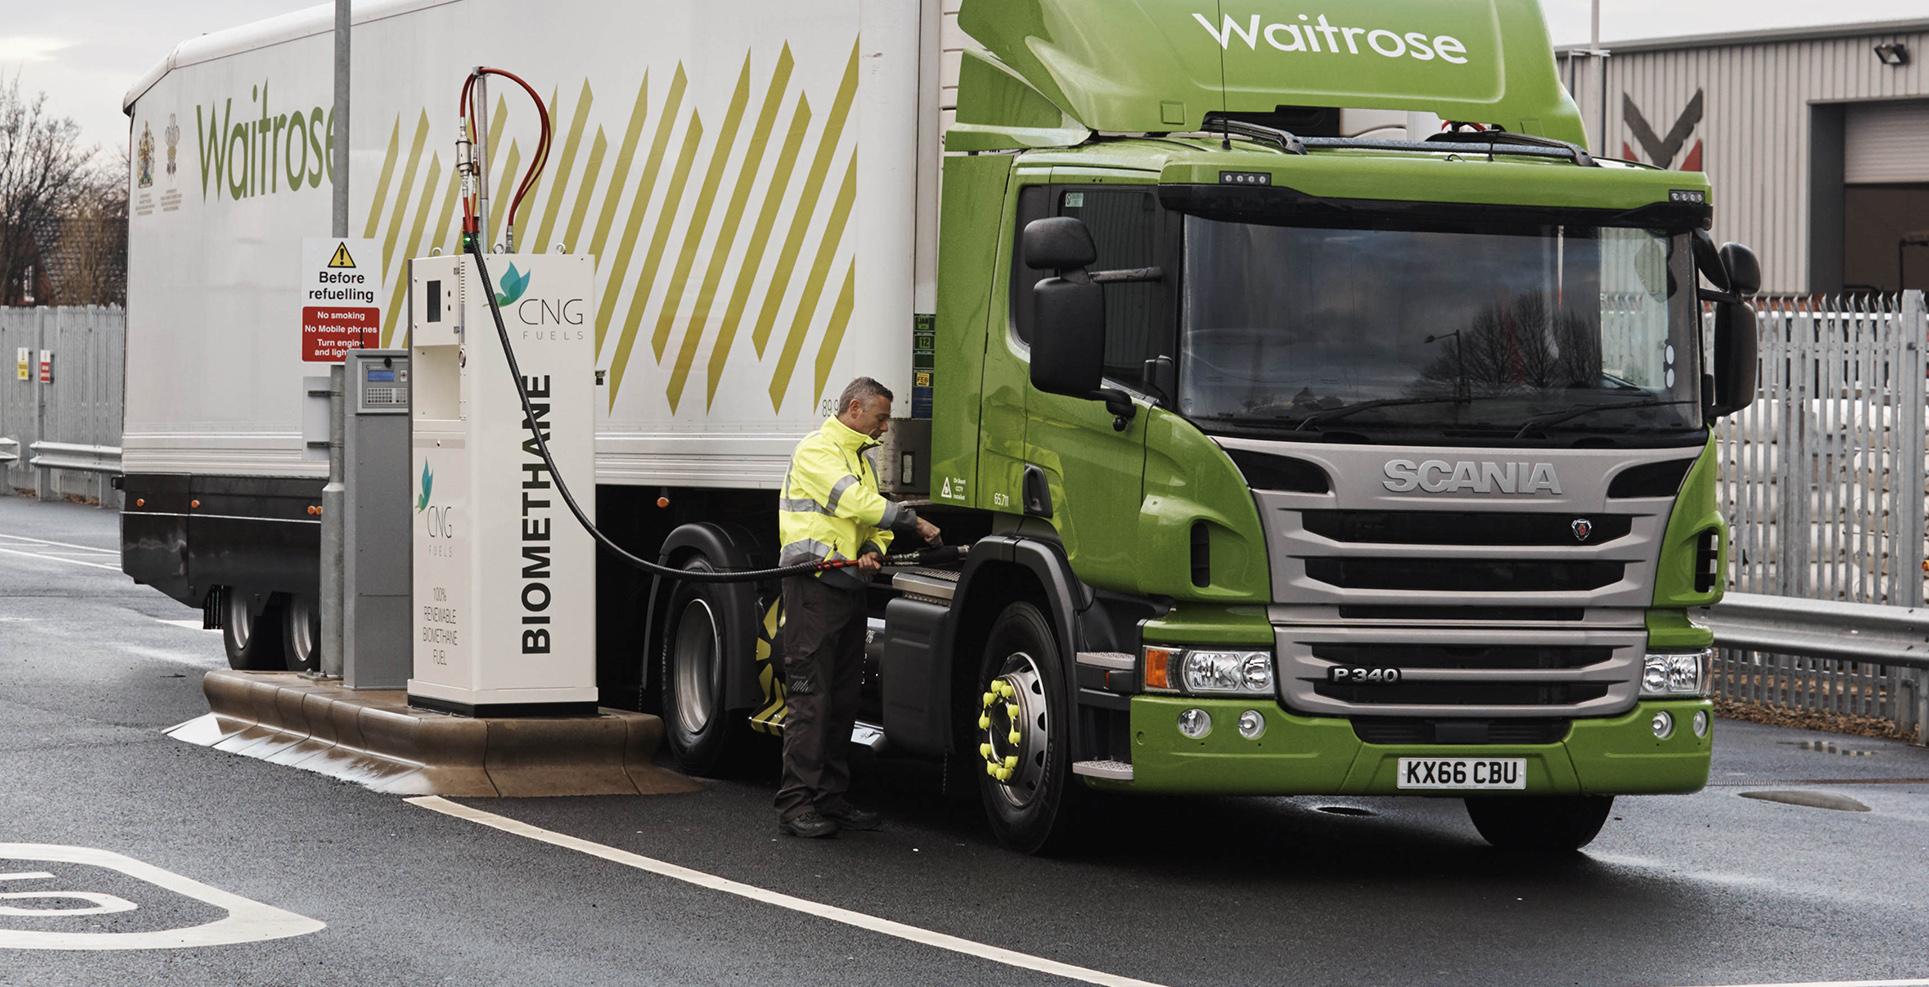 Alternative truck fuels - Bio Methane CNG Waitrose